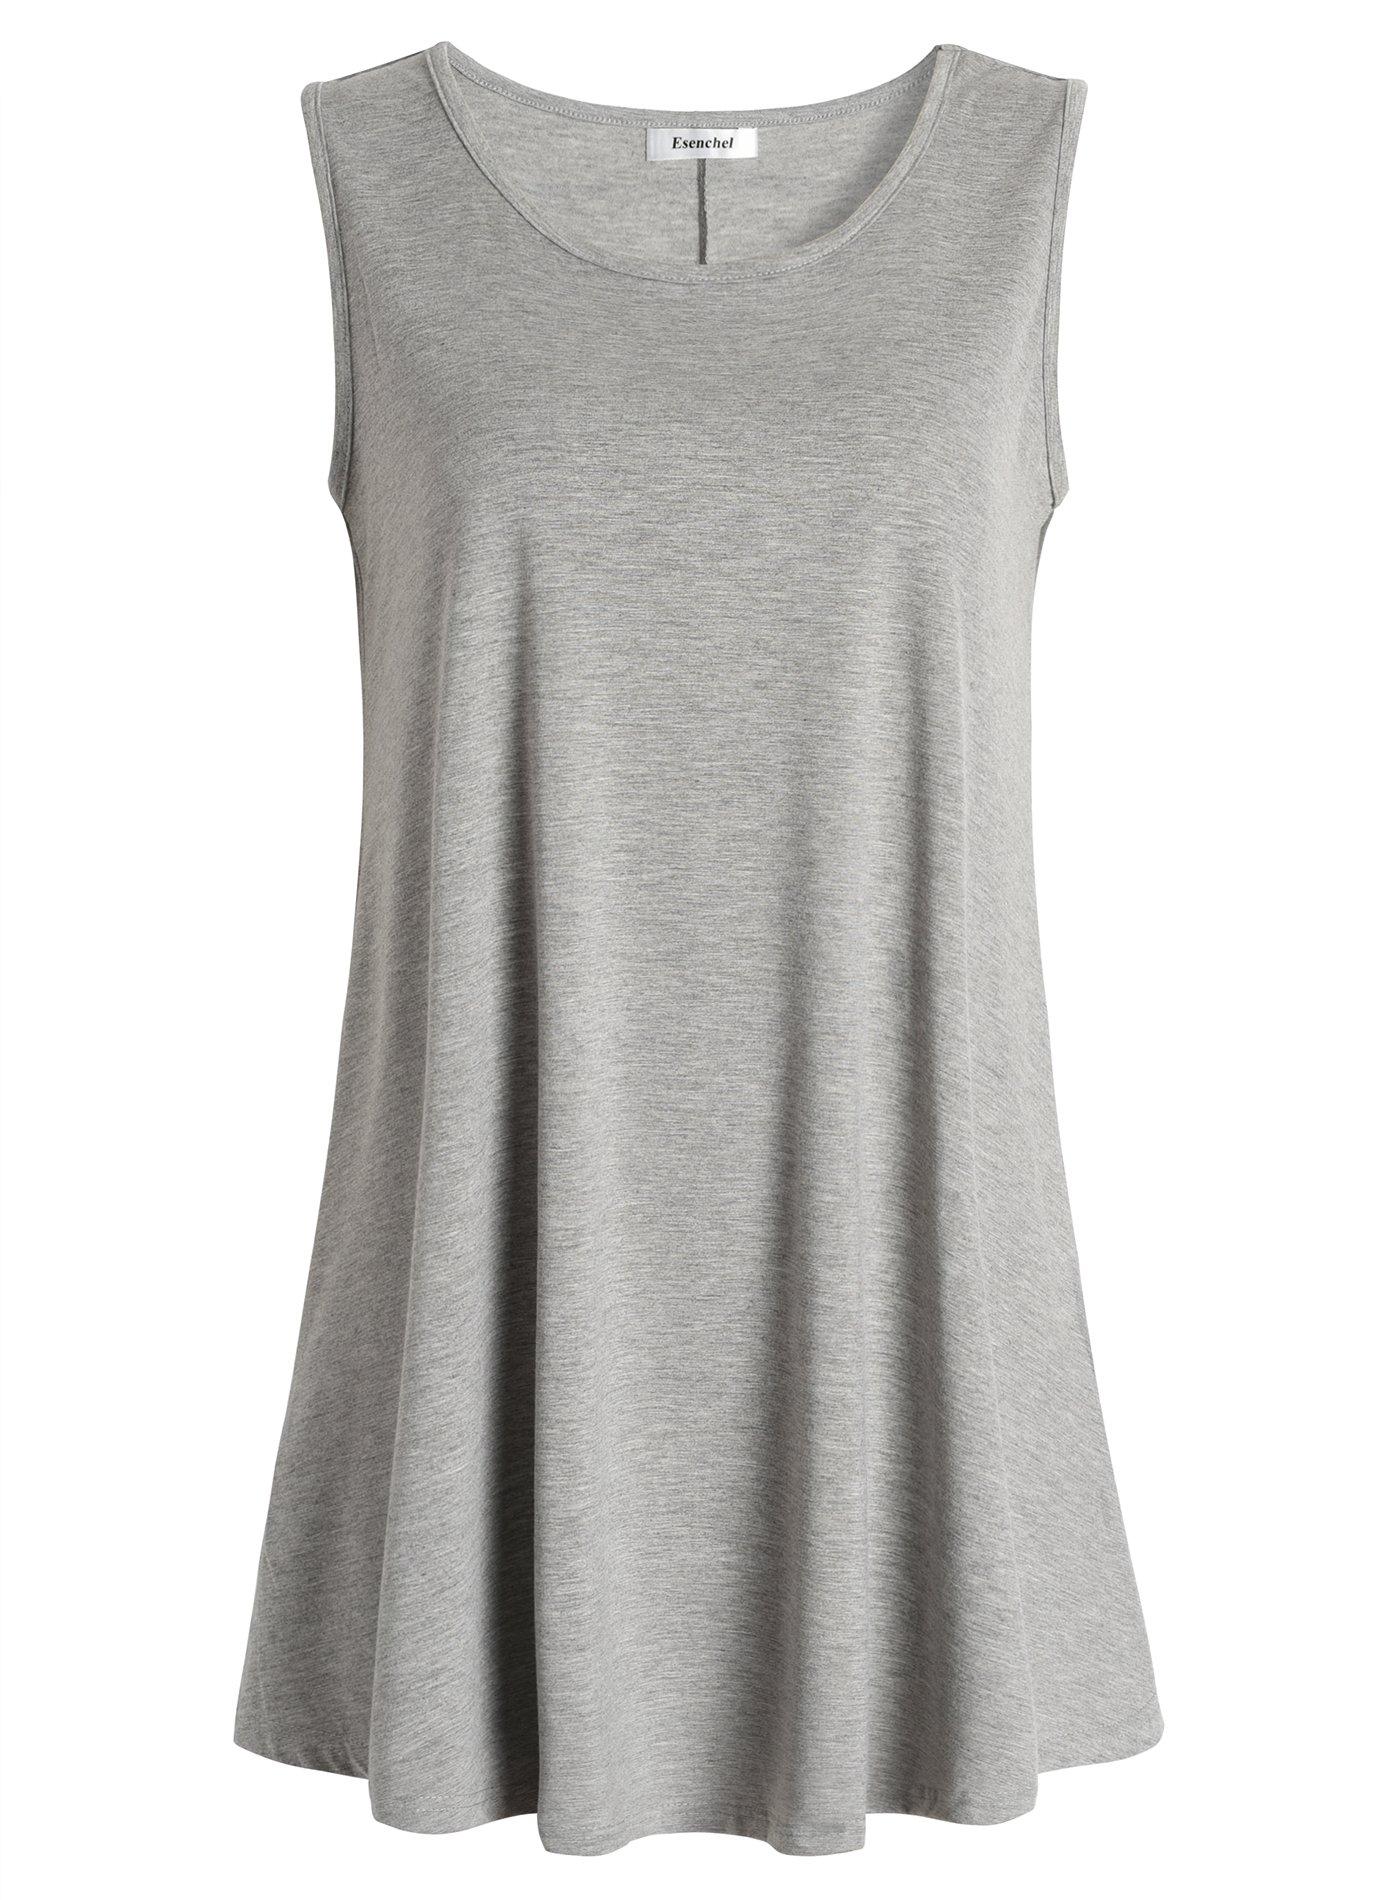 Esenchel Women's Flowy Sleeveless Tunic Top for Leggings 2X Heather Gray